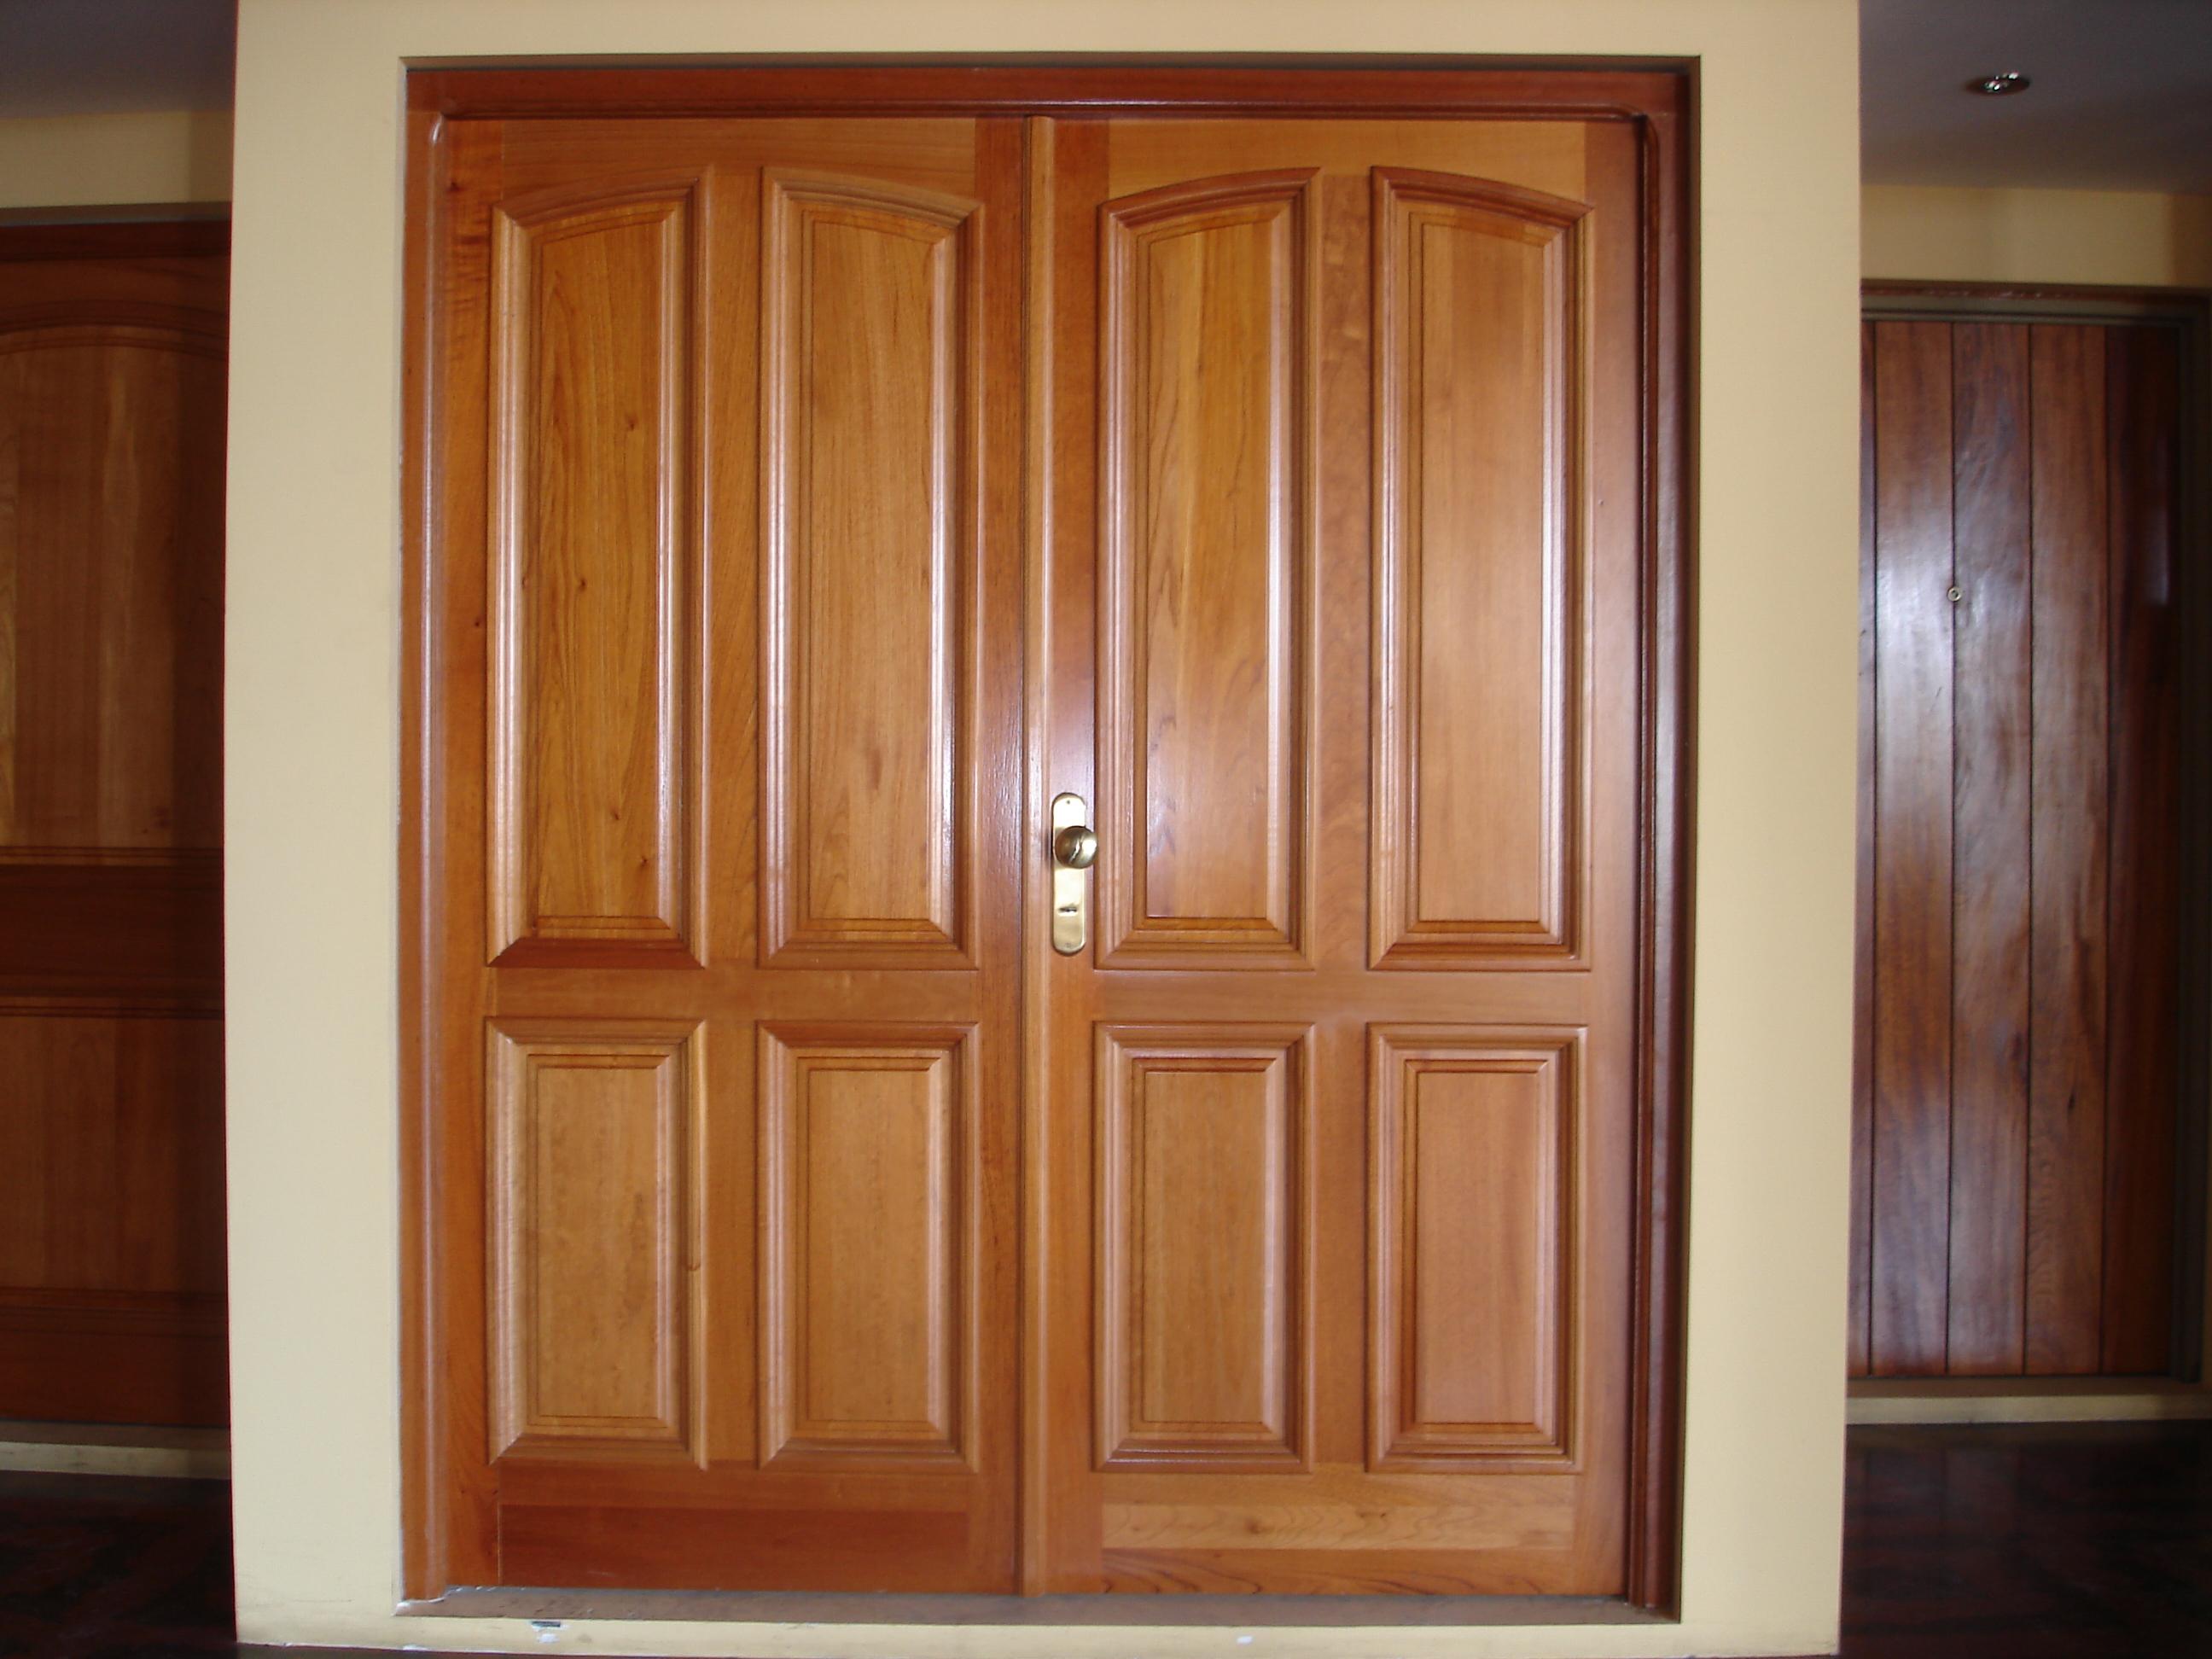 Top puertas madera para muebles wallpapers - Puertas de madera ...